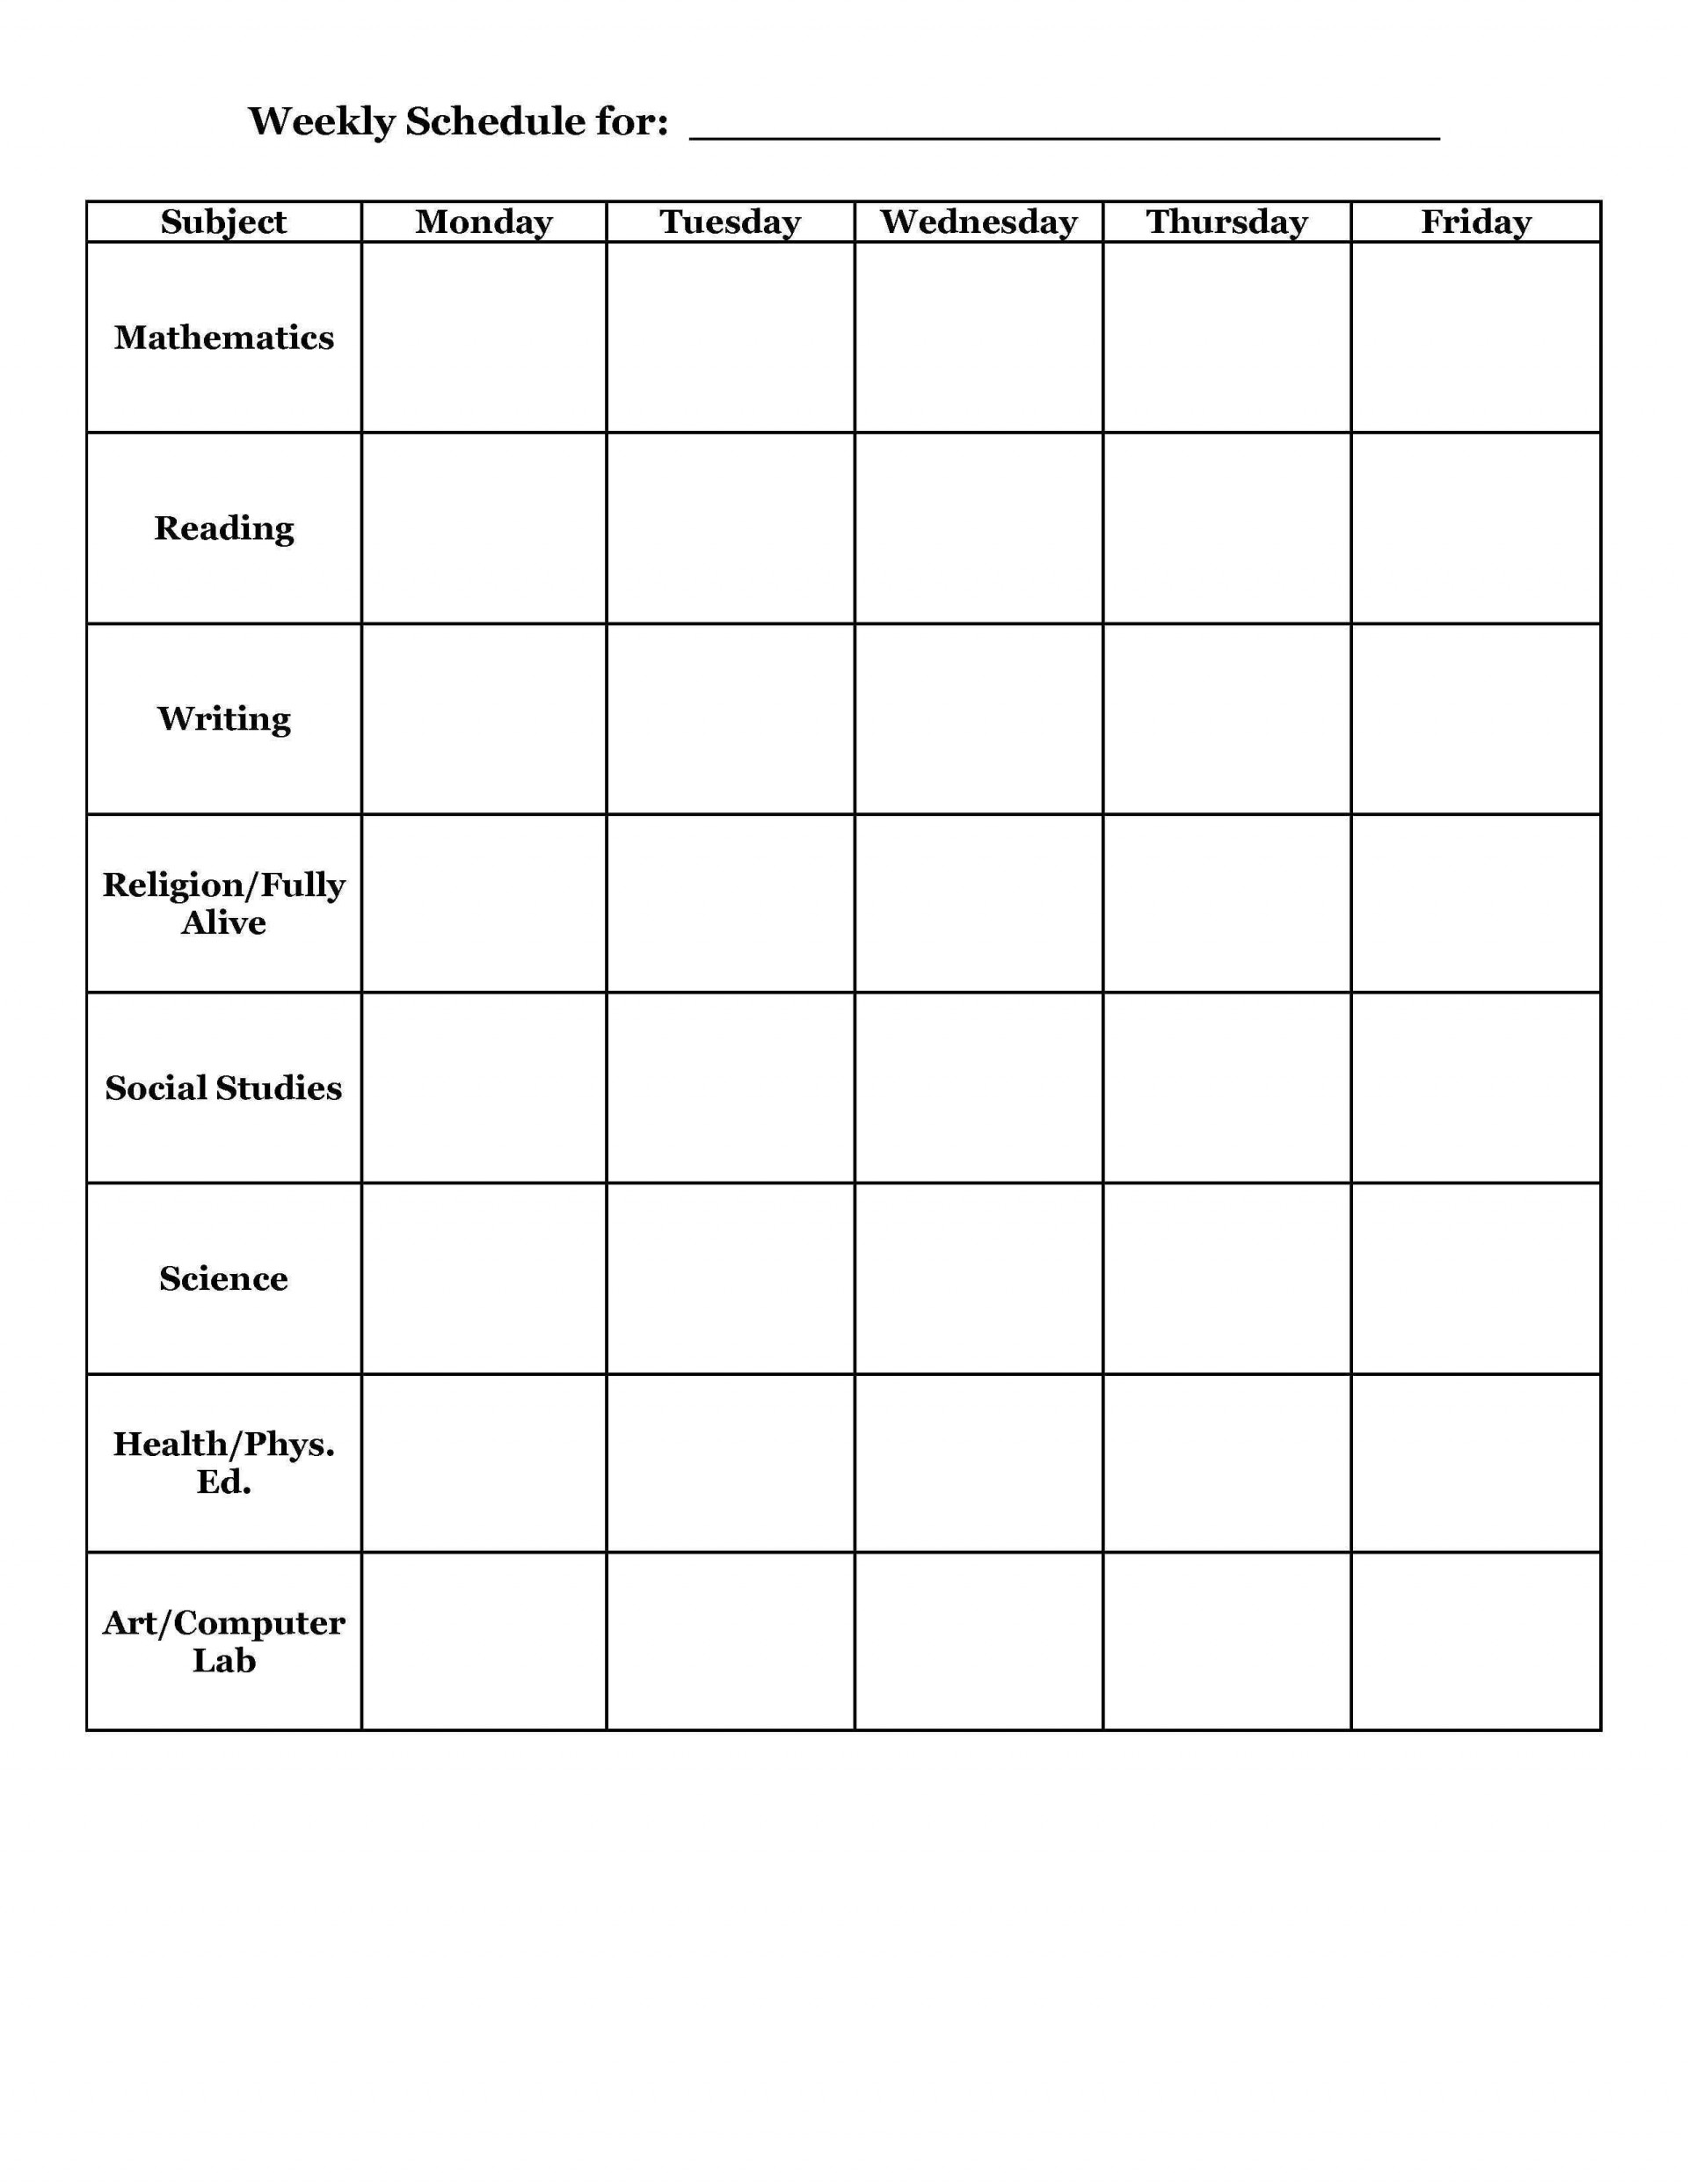 002 Shocking Weekly School Planner Template Sample  Lesson Plan Primary Planning Schedule Printable1920